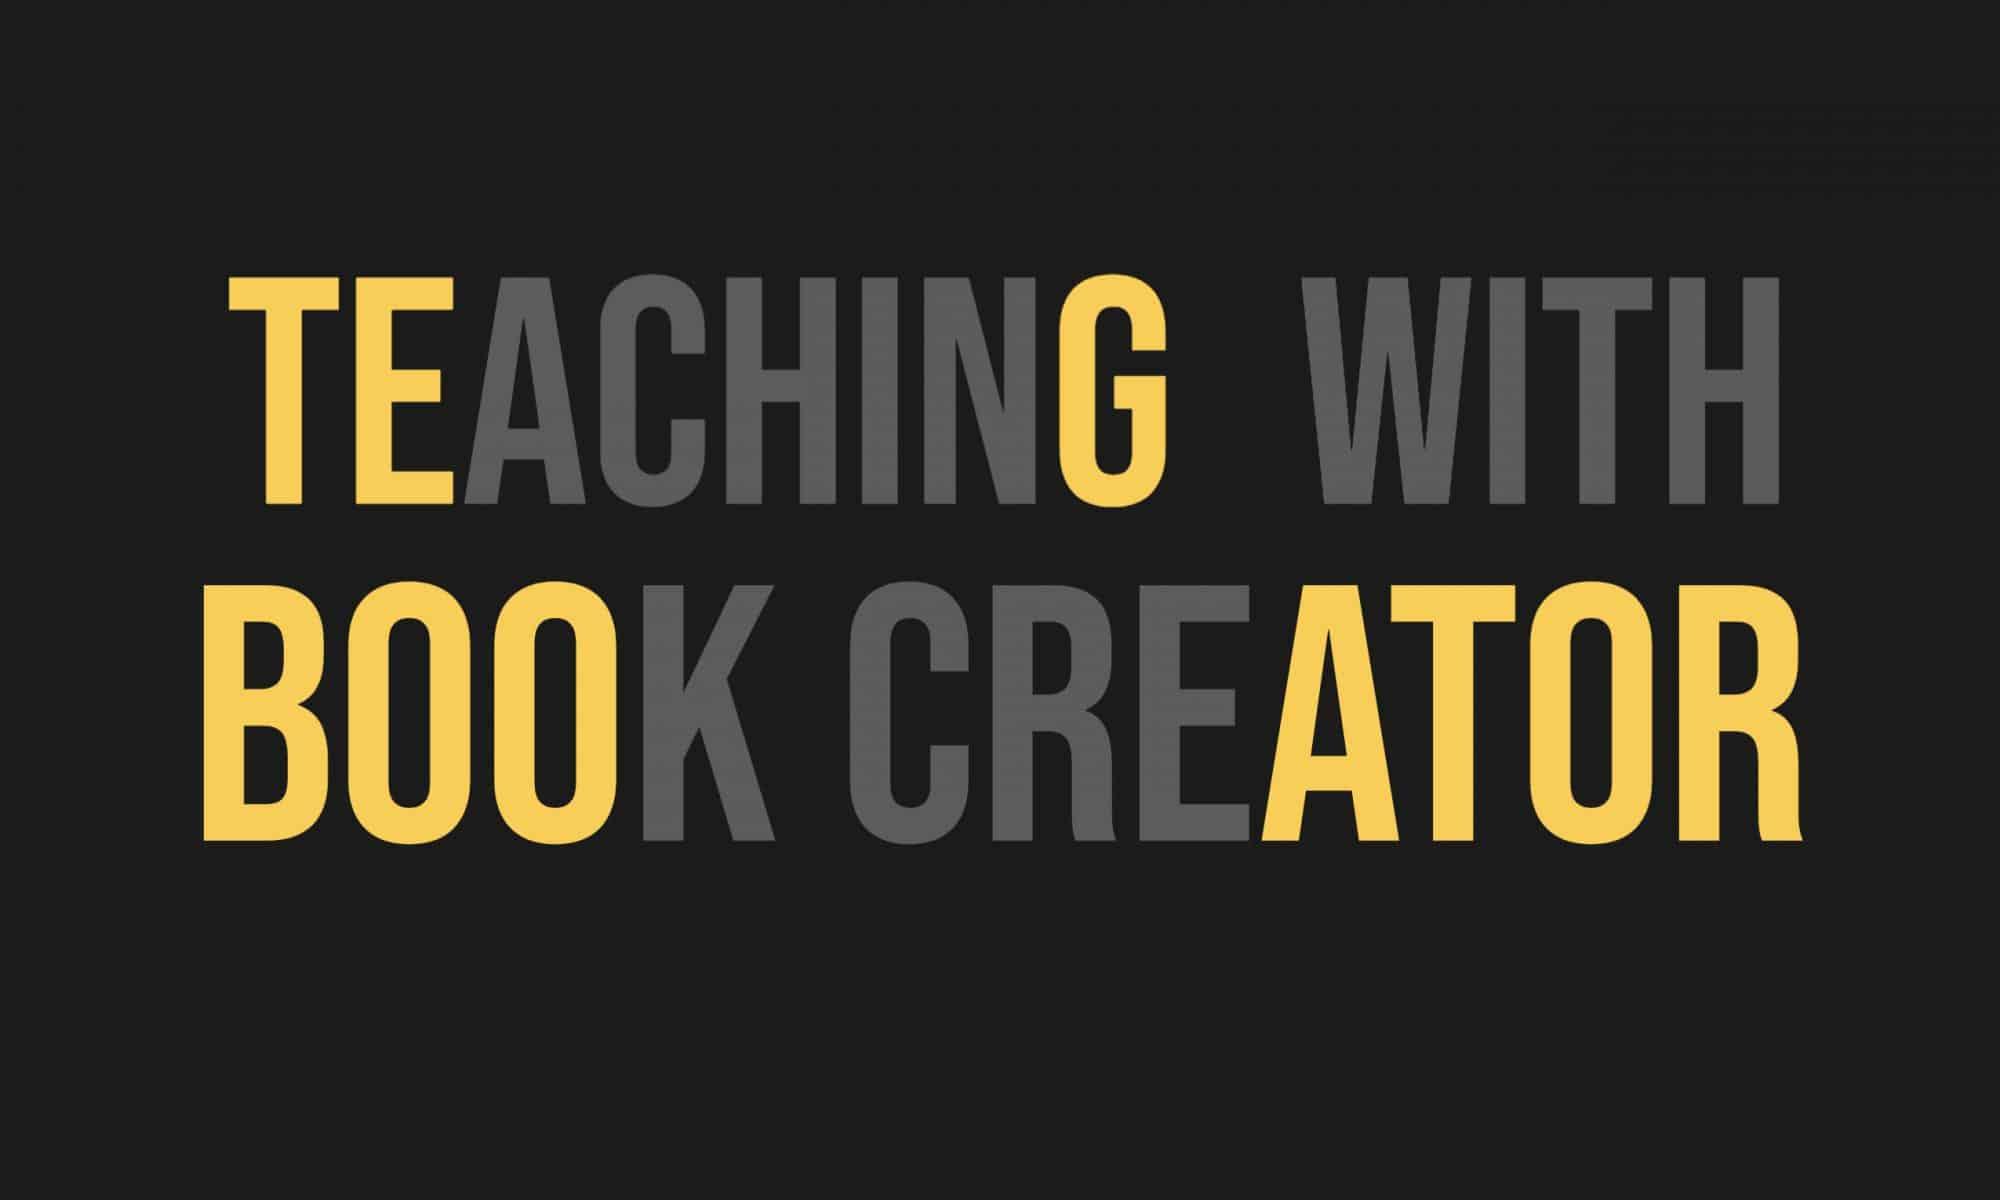 Teaching with Book Creator